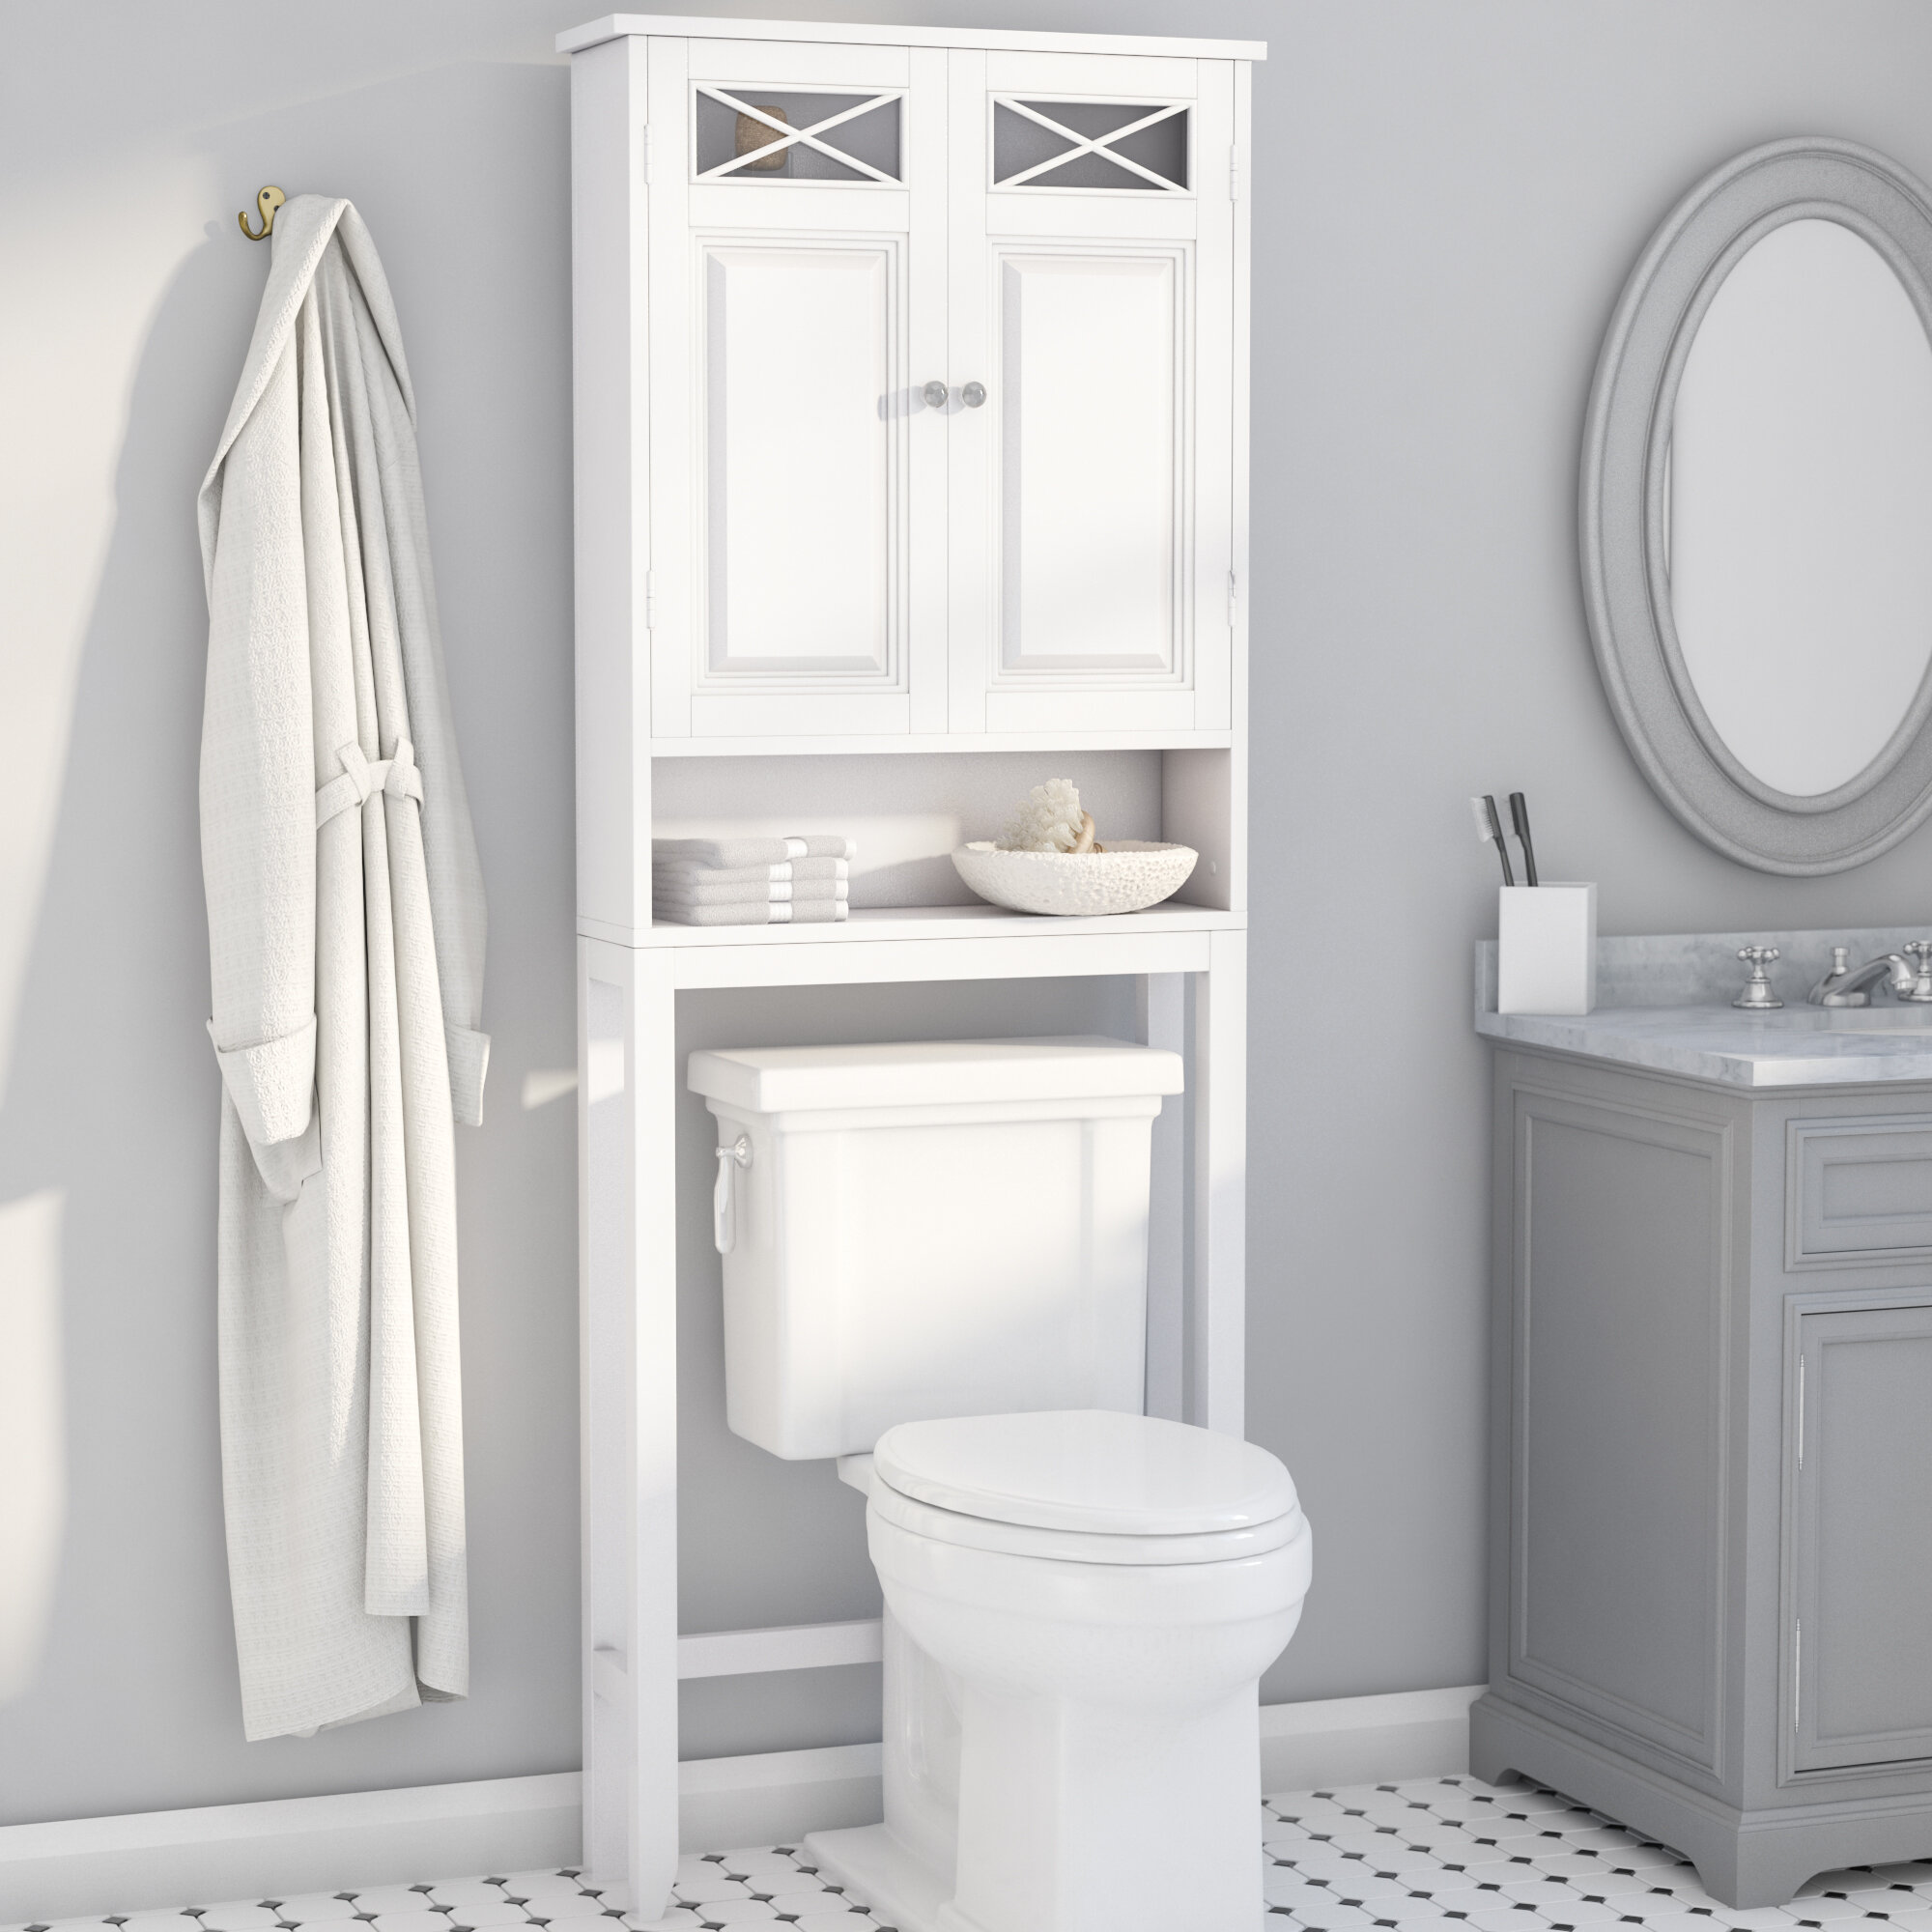 "Darby Home Co Coddington 25"" W x 68"" H Over The Toilet Storage & Reviews | Wayfair"